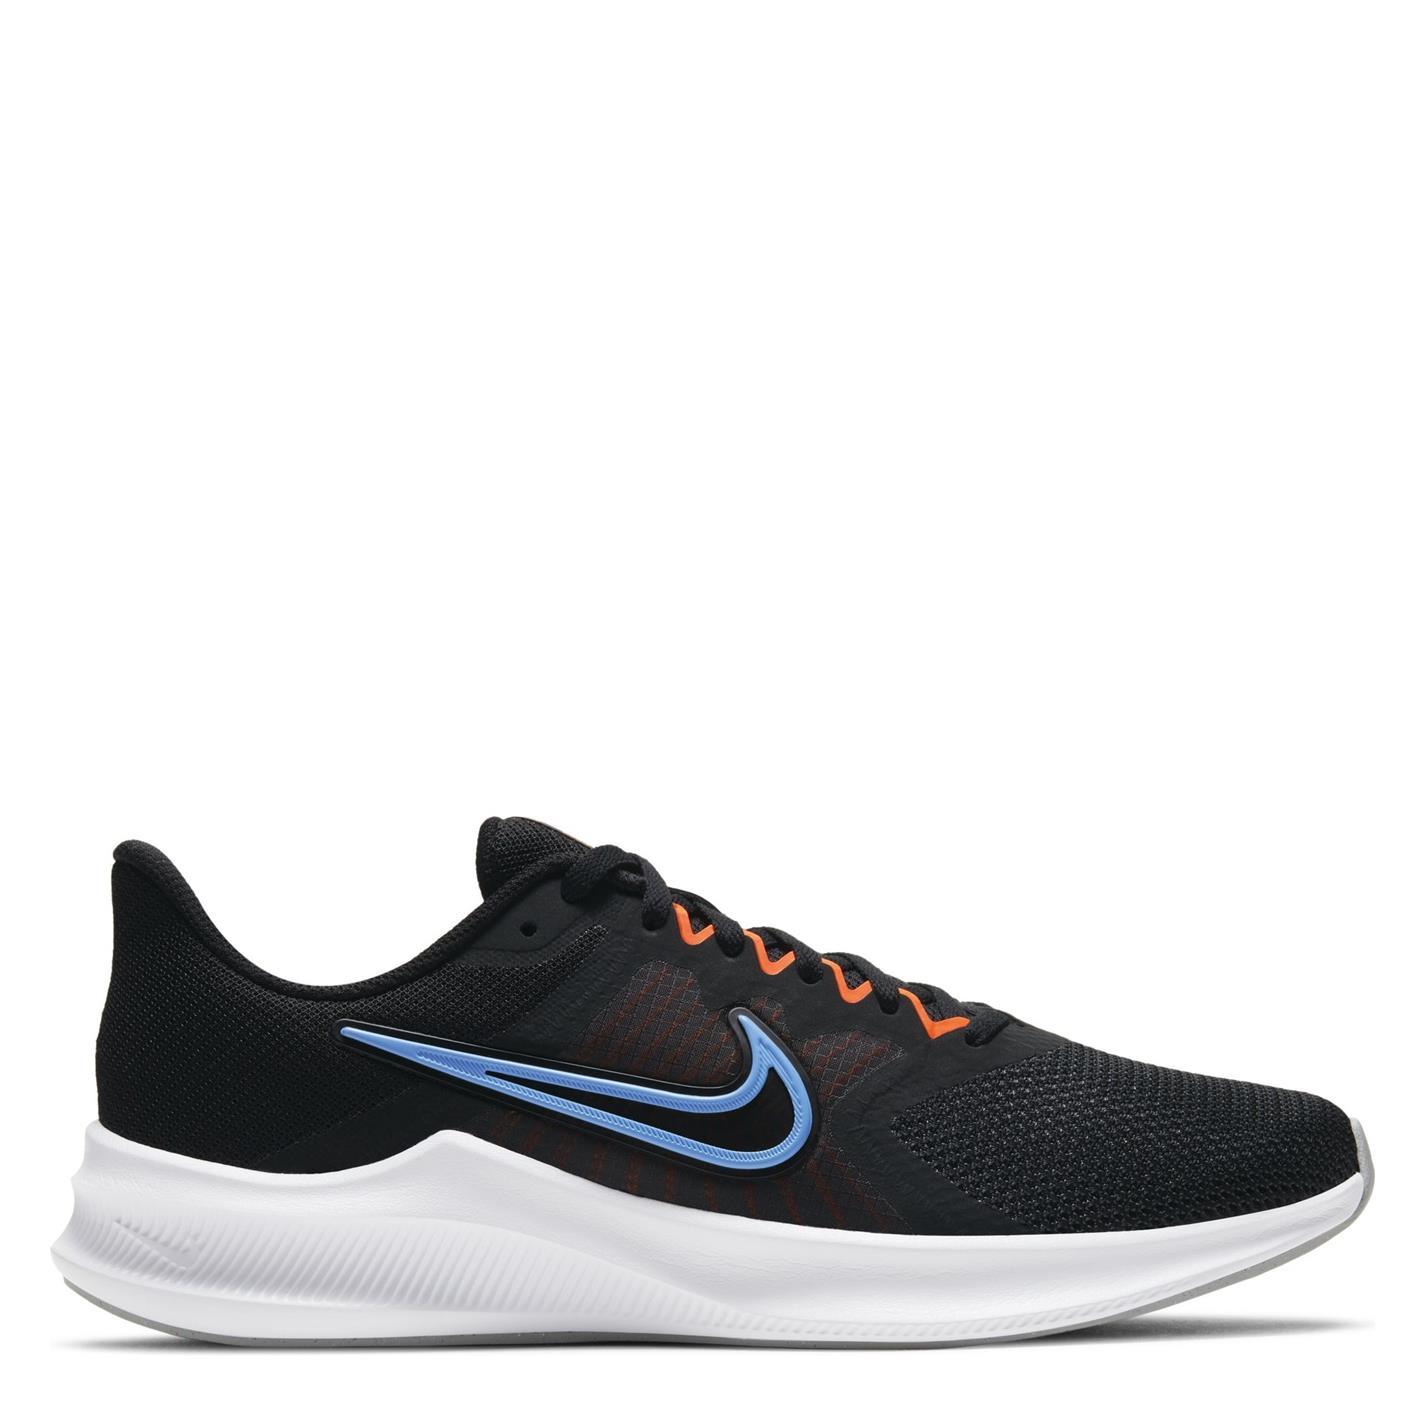 Adidasi alergare Nike Downshifter 11 pentru Barbati negru albastru portocaliu